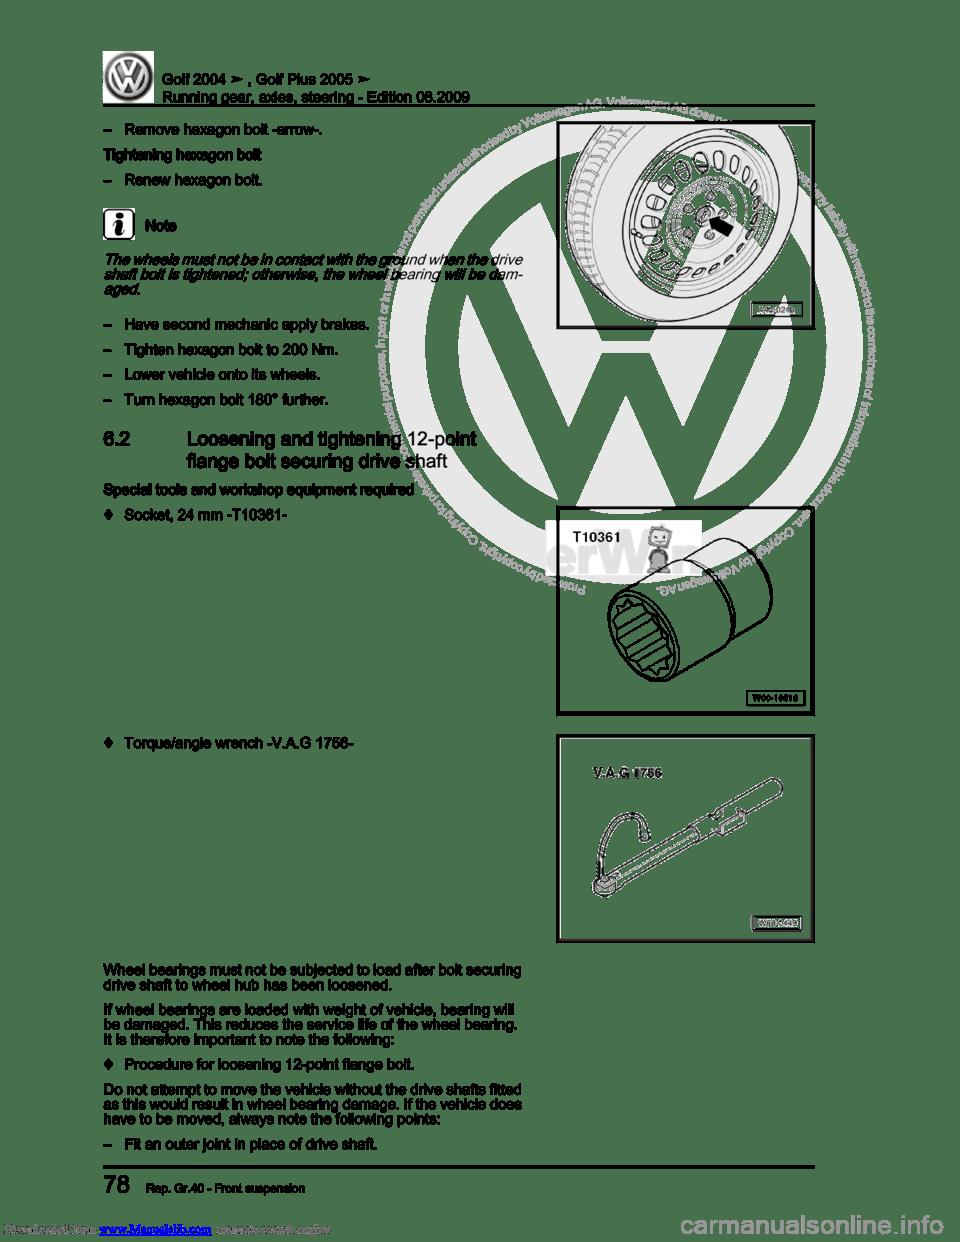 Golf Mark 4 Manual Auto Electrical Wiring Diagram Cadillac Escalade 2002 Ac 2003 Dodge Dakota Trailer 2008 Mack Cxu613 Fuse Panel 2006 Kenworth T2000 Box Lincoln Navigator 2007